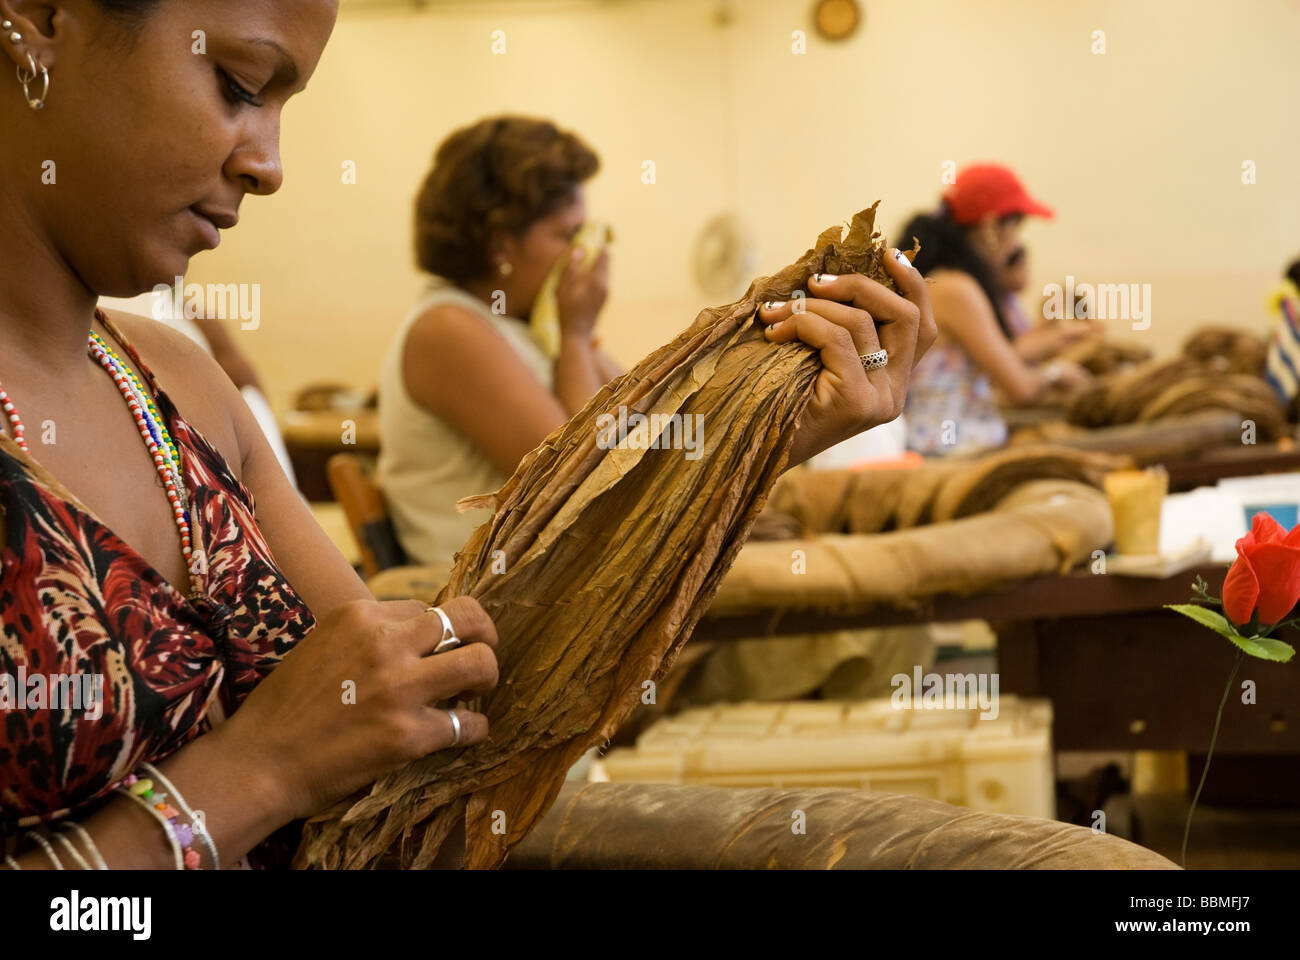 Cuba, Havana. Grading tobacco leaves, The H. Upmann Cigar Factory, Havana, Cuba - Stock Image